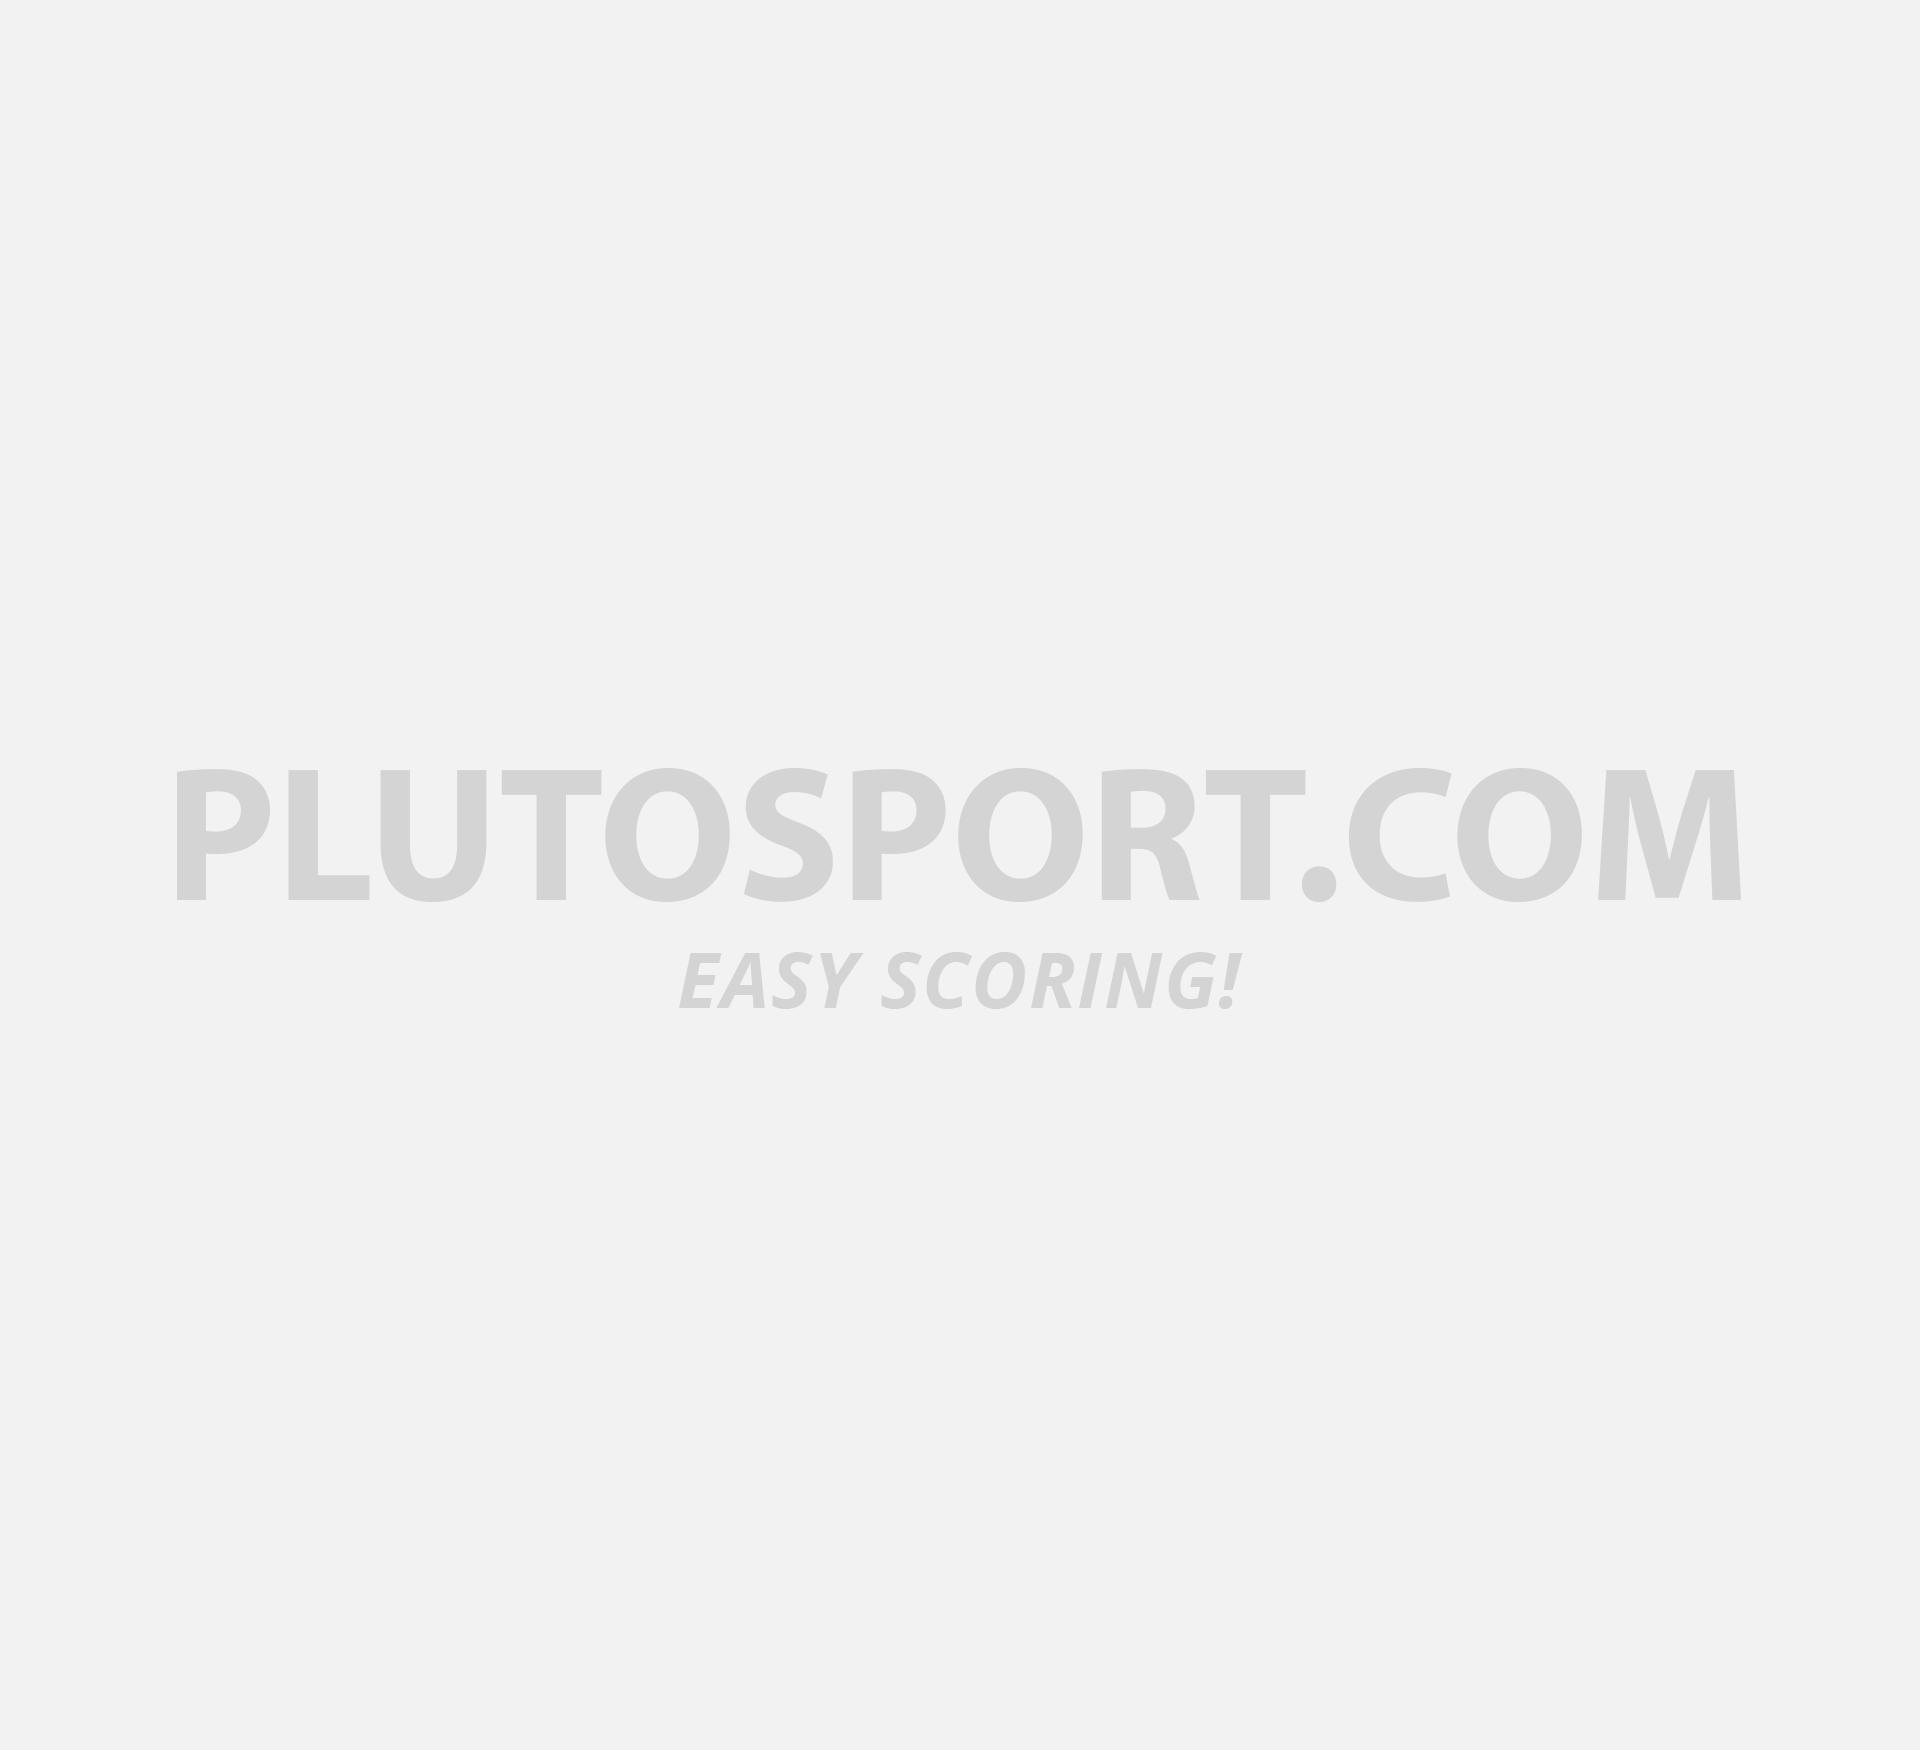 Nike Benassi JDI - Bath slippers - Flip flops - Shoes - Lifestyle - Sports   dd0ab7fab